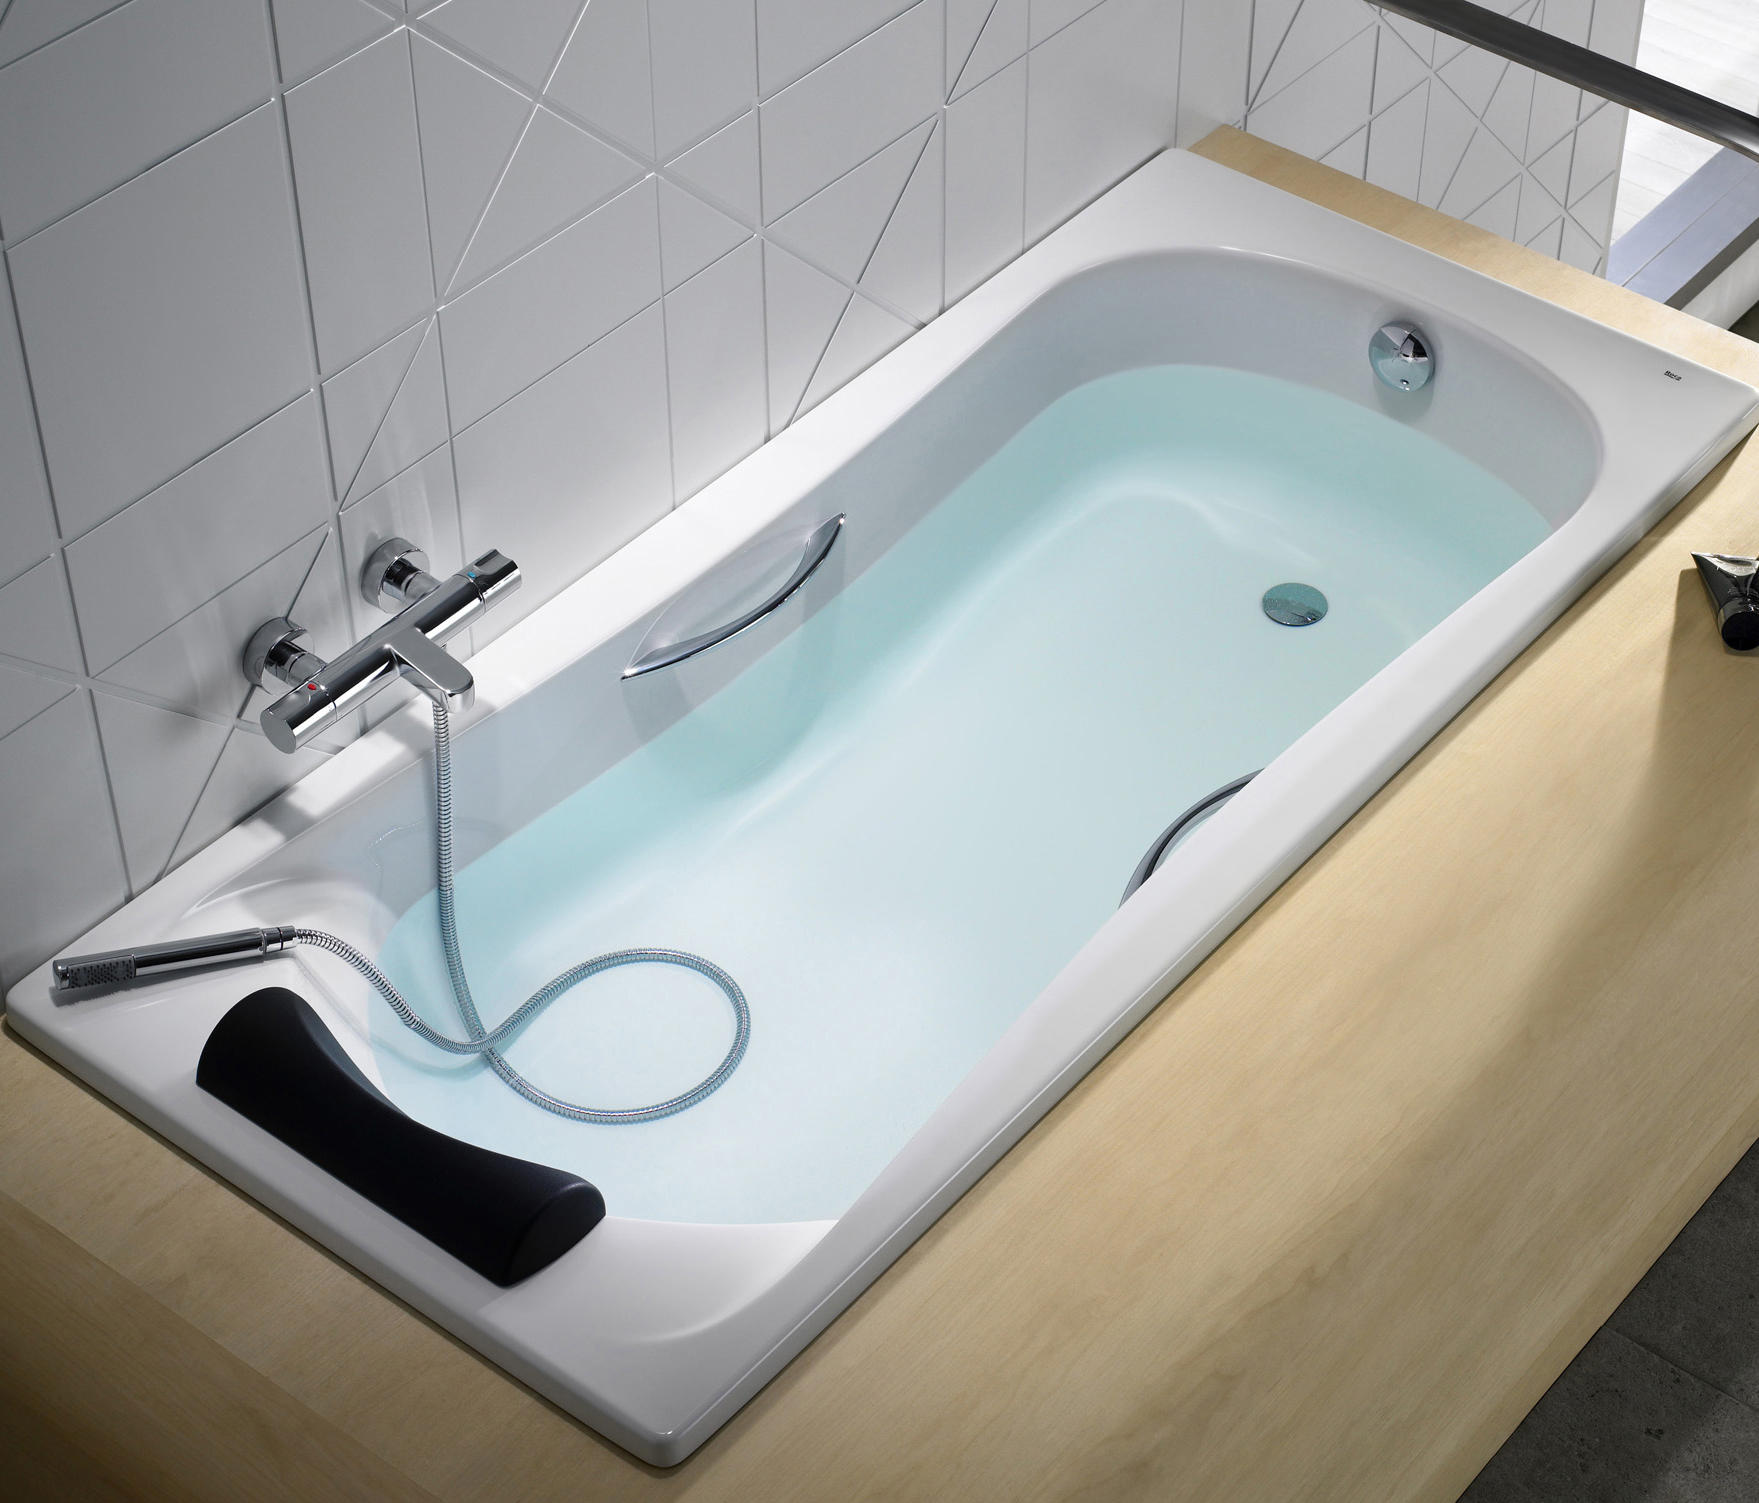 becool bath built in bathtubs from roca architonic becool bath by roca becool bath by roca